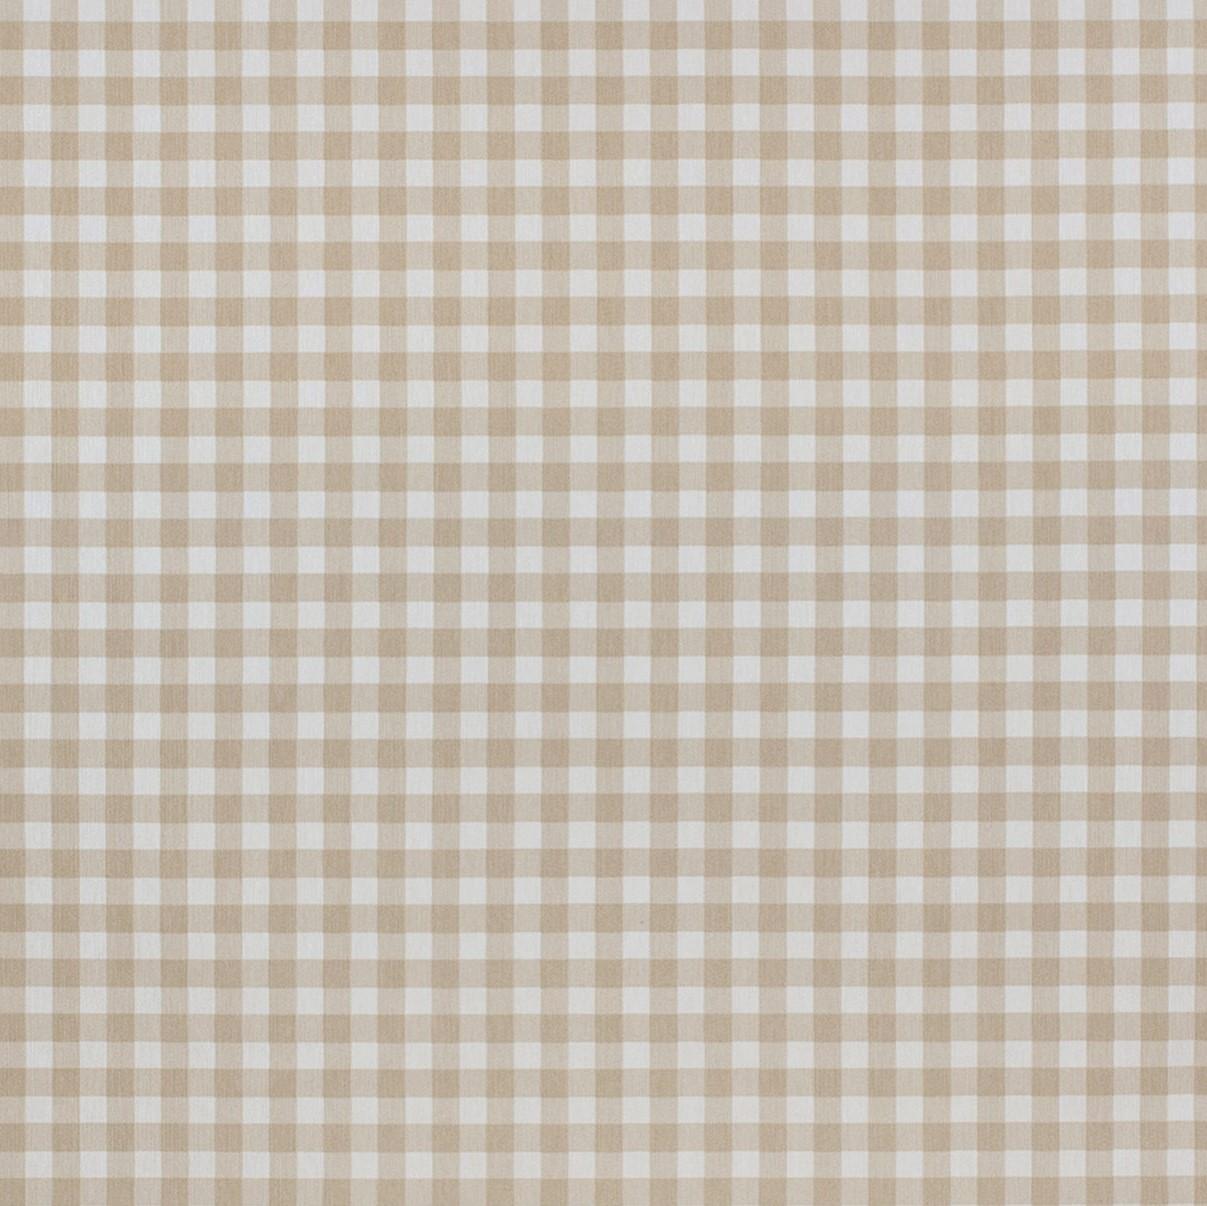 Mantel BISTROTBEIGE Cuadrícula1,3cm Rectangular 1,8x2,7 m [porconfeccionar] [listoen5·7días]